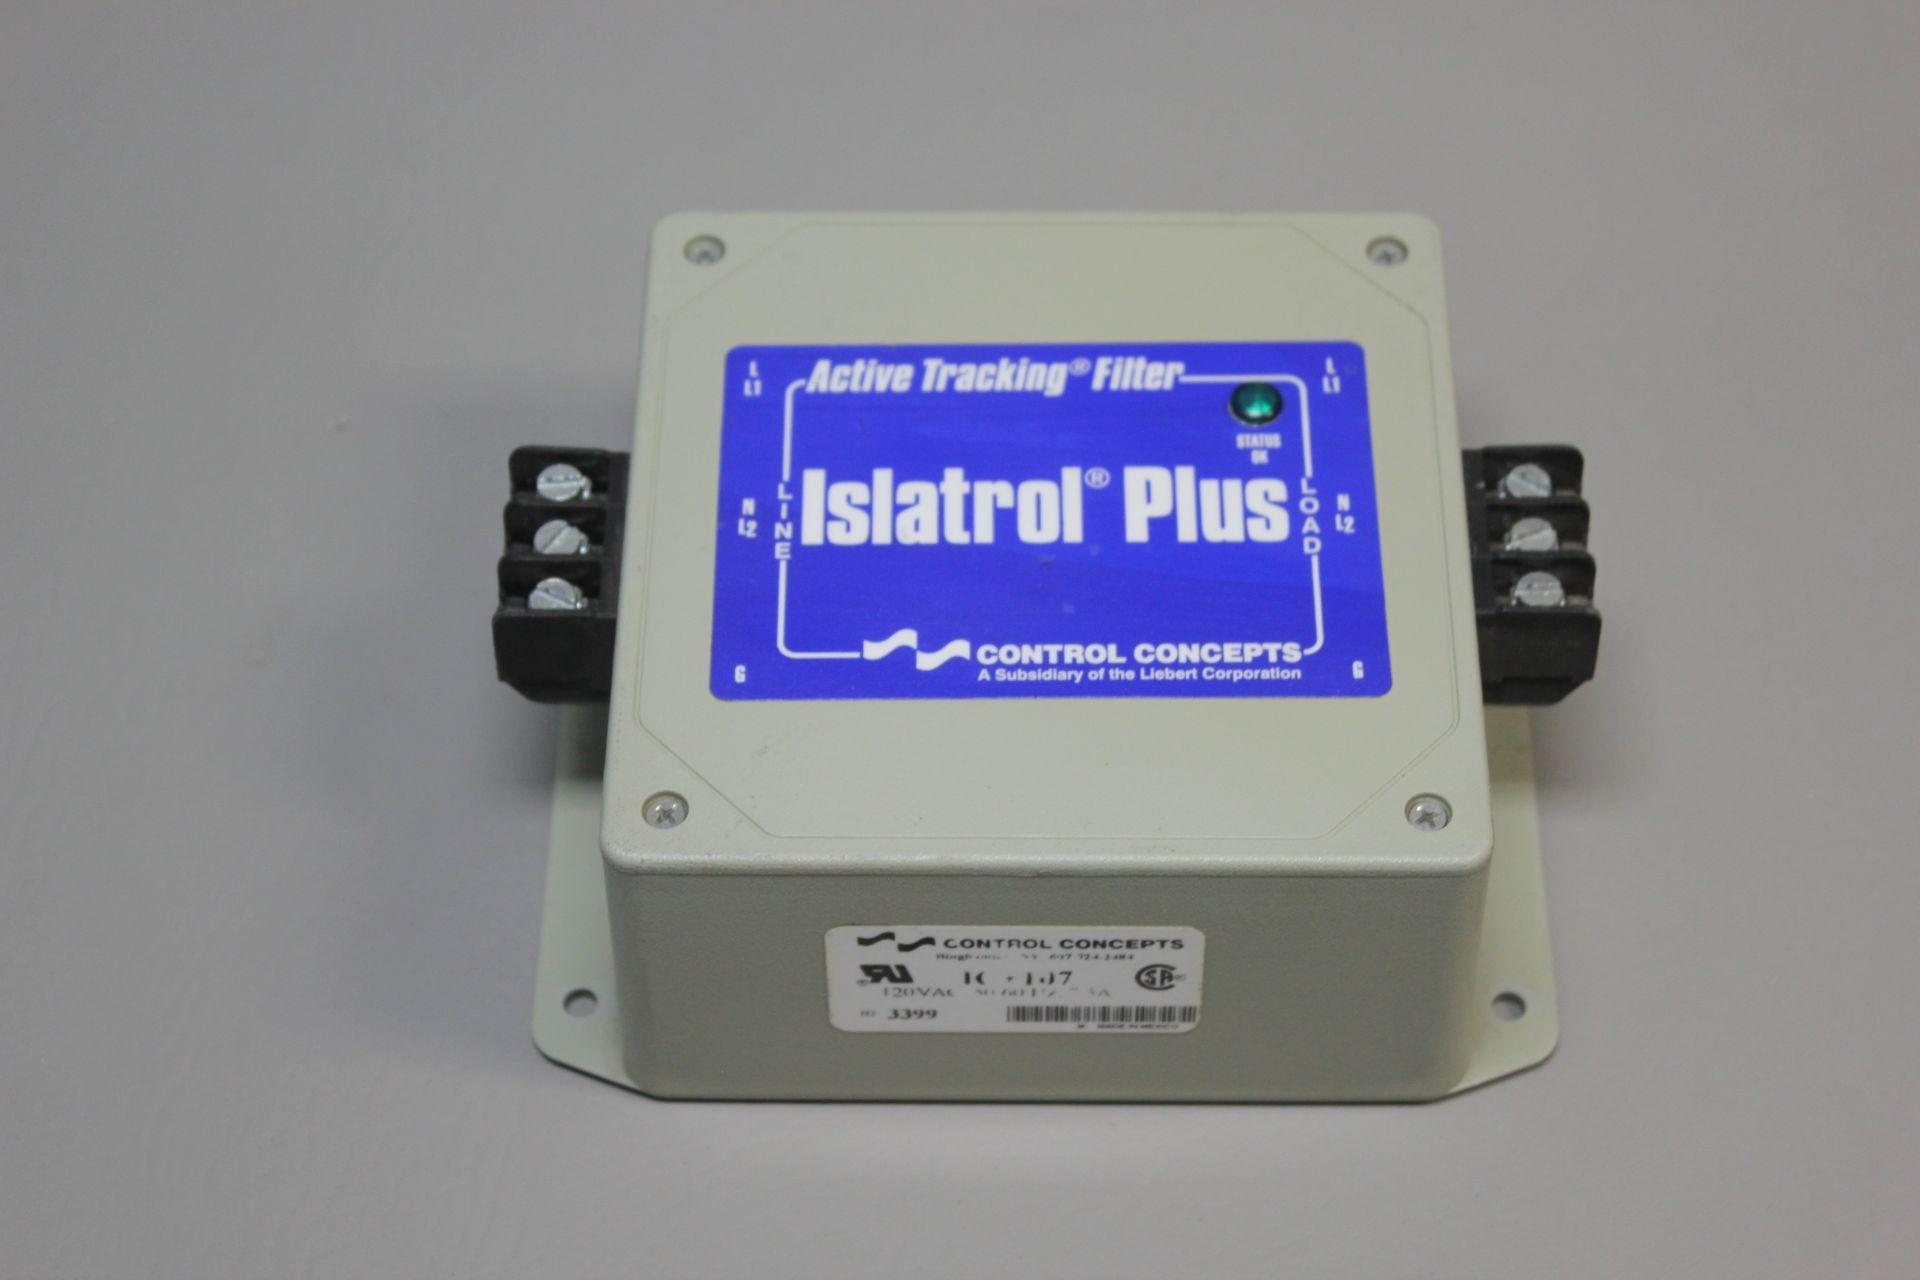 ISLATROL PLUS ACTIVE TRACKING FILTER